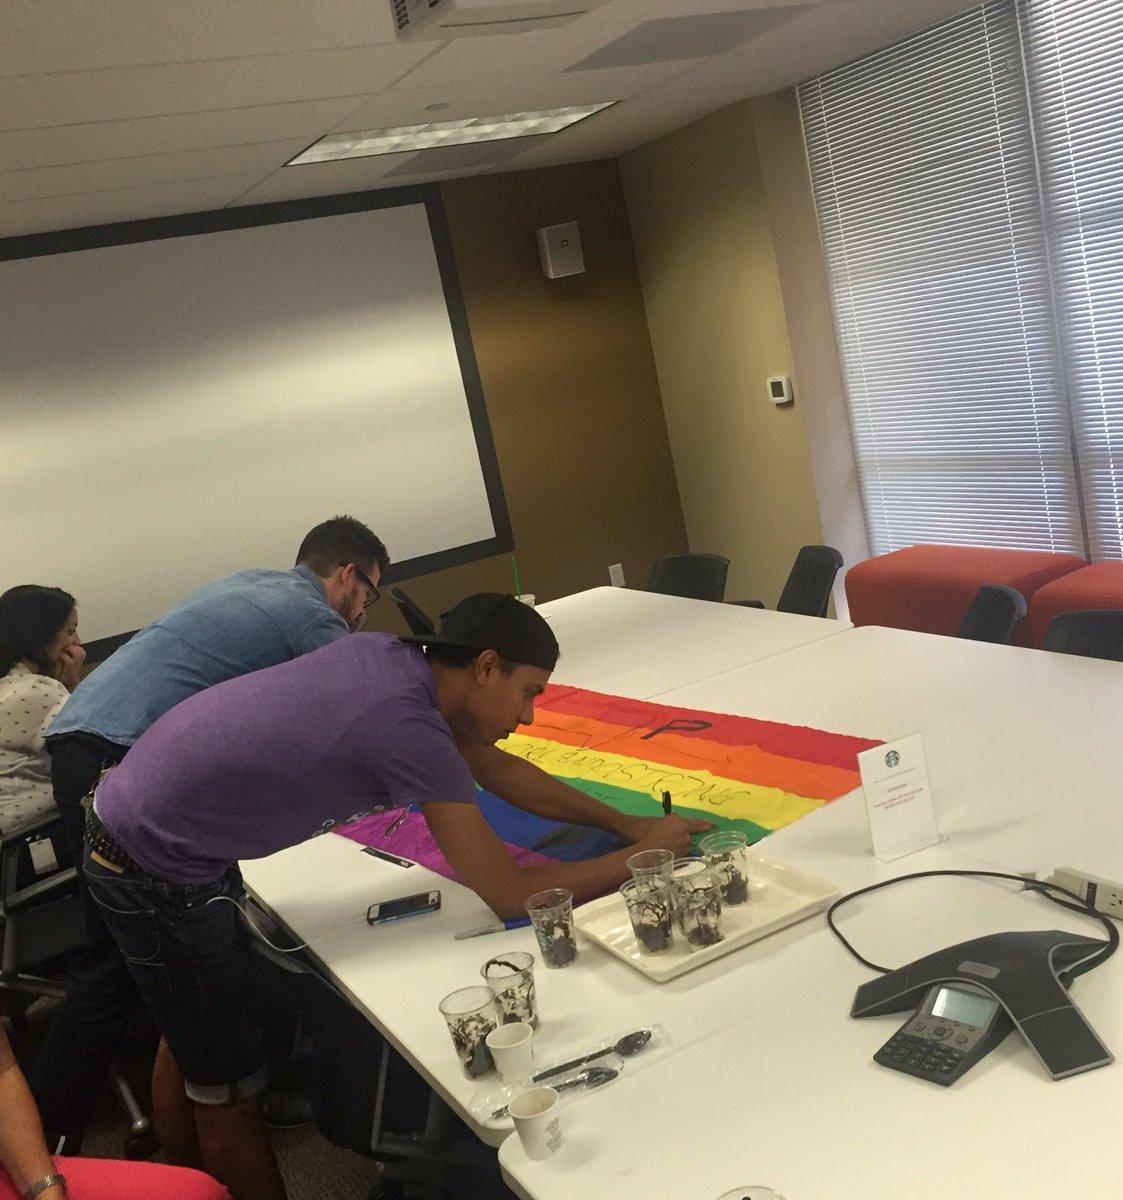 Chris Musser On Twitter Starbucks Partners In Miami Sign A Pride Flag For Our Orlando Bbooher Cherylharvey1 Djacobdarren